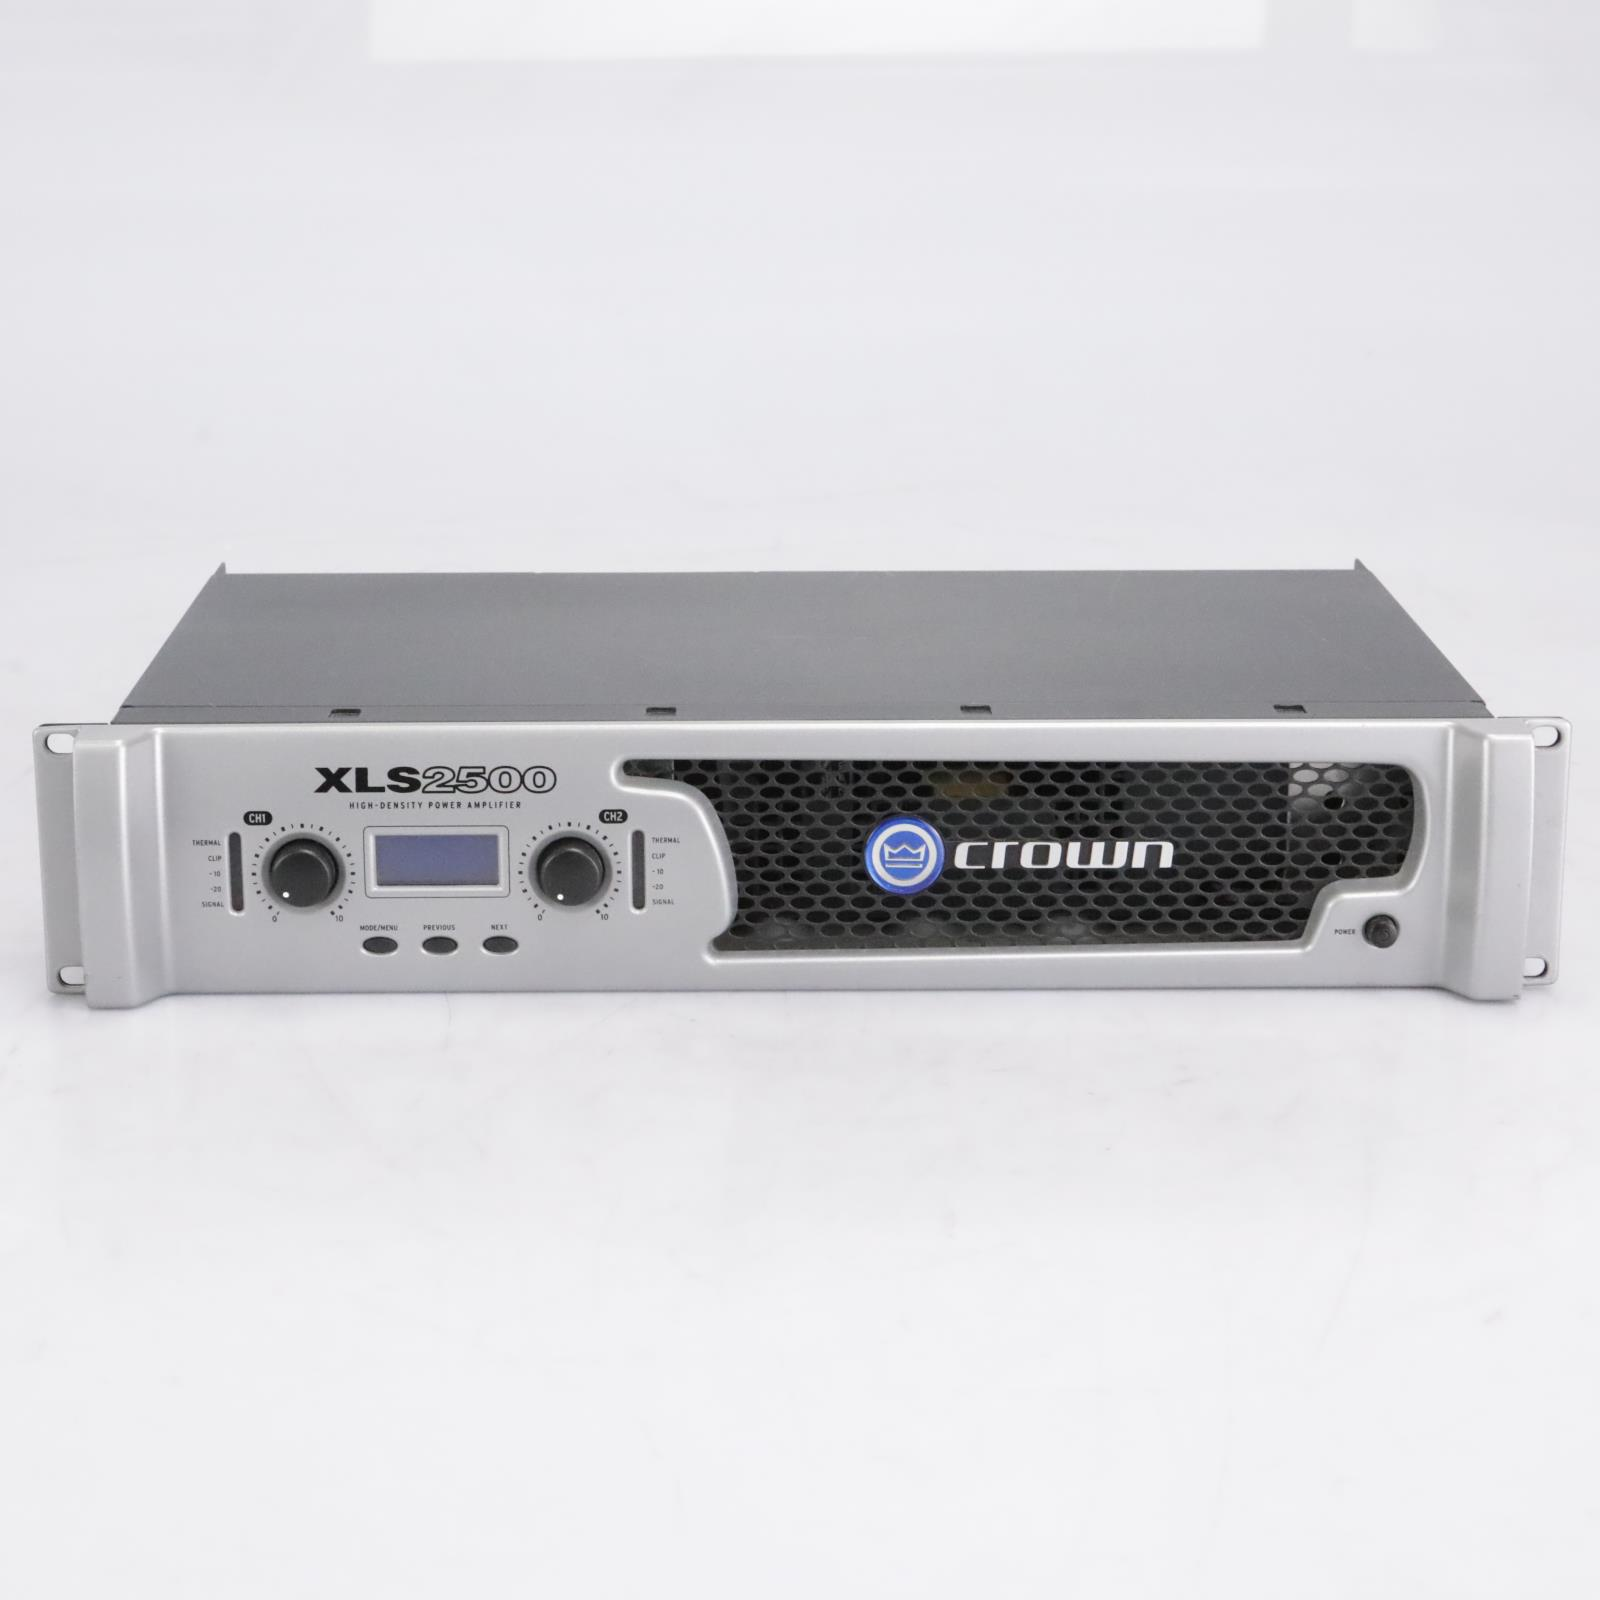 Crown XLS 2500 2-Channel, 775W @ 4Ω Power Amplifier Amp w/ Speaker Cables #42609